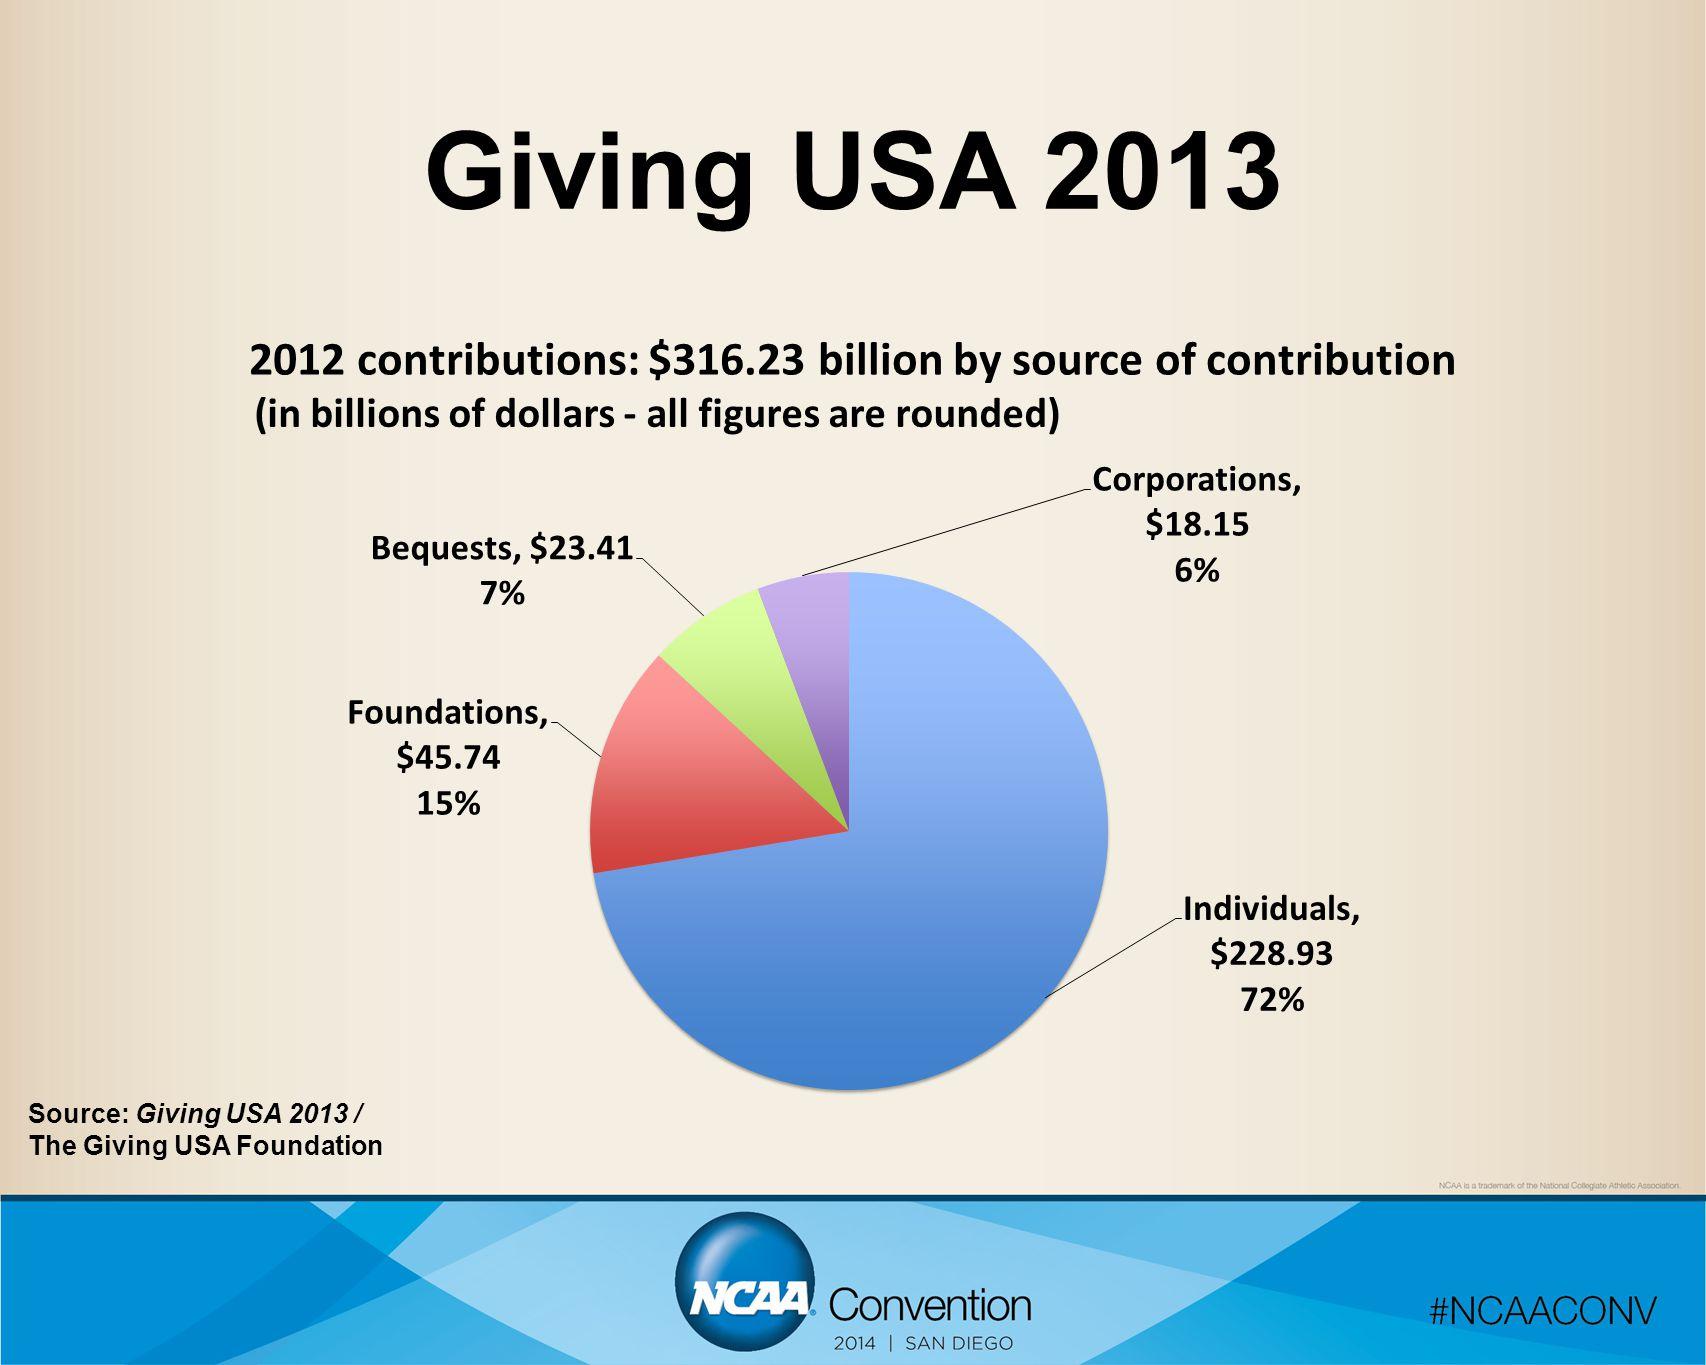 Giving USA 2013 Source: Giving USA 2013 / The Giving USA Foundation